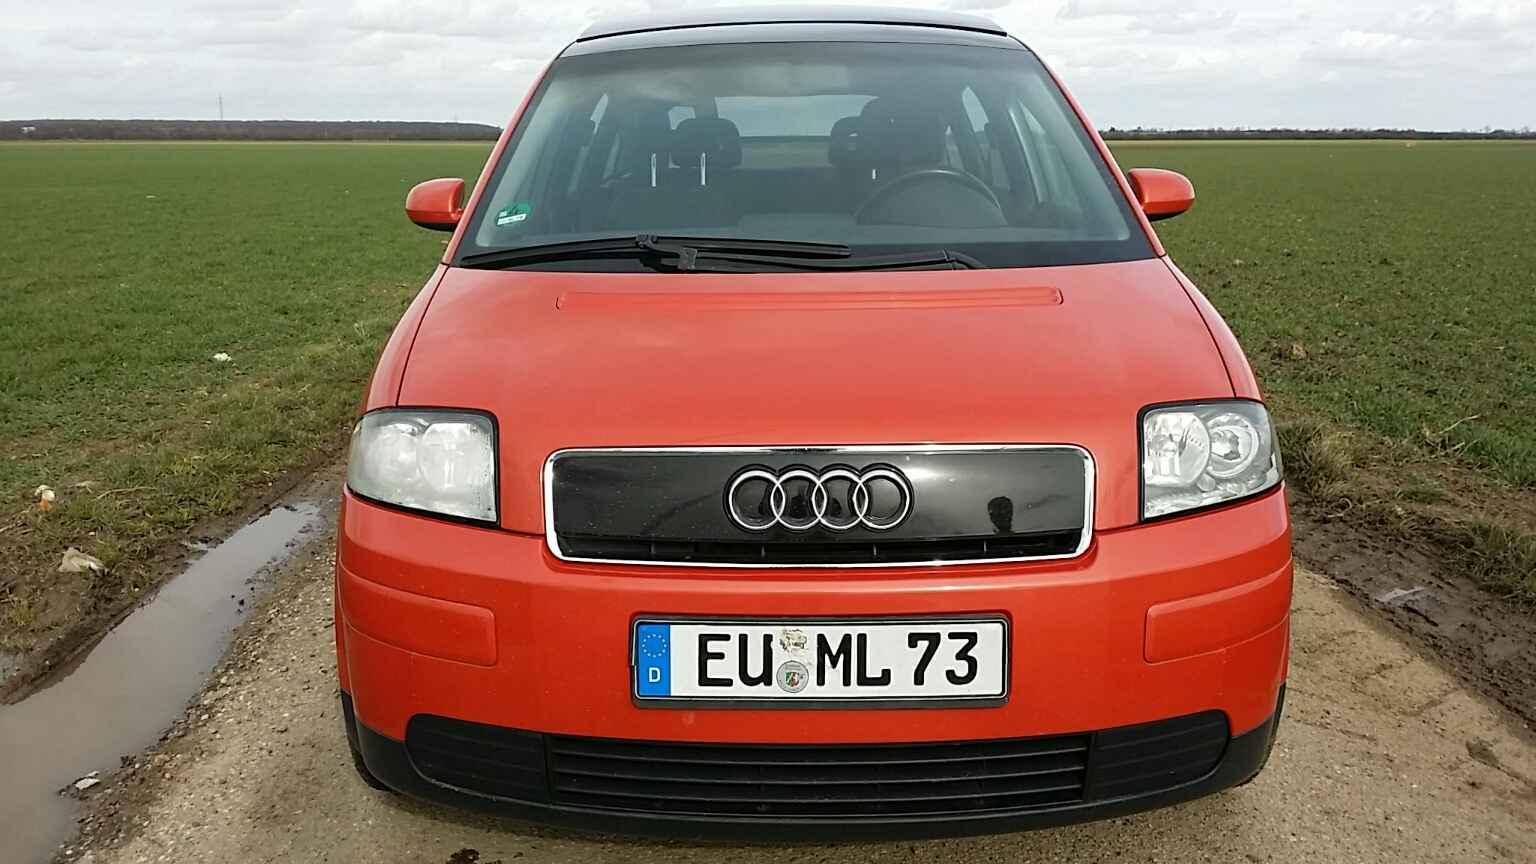 Audi06.jpg.717a9574c0cb8e66ac07173ffe6a3a2c.jpg